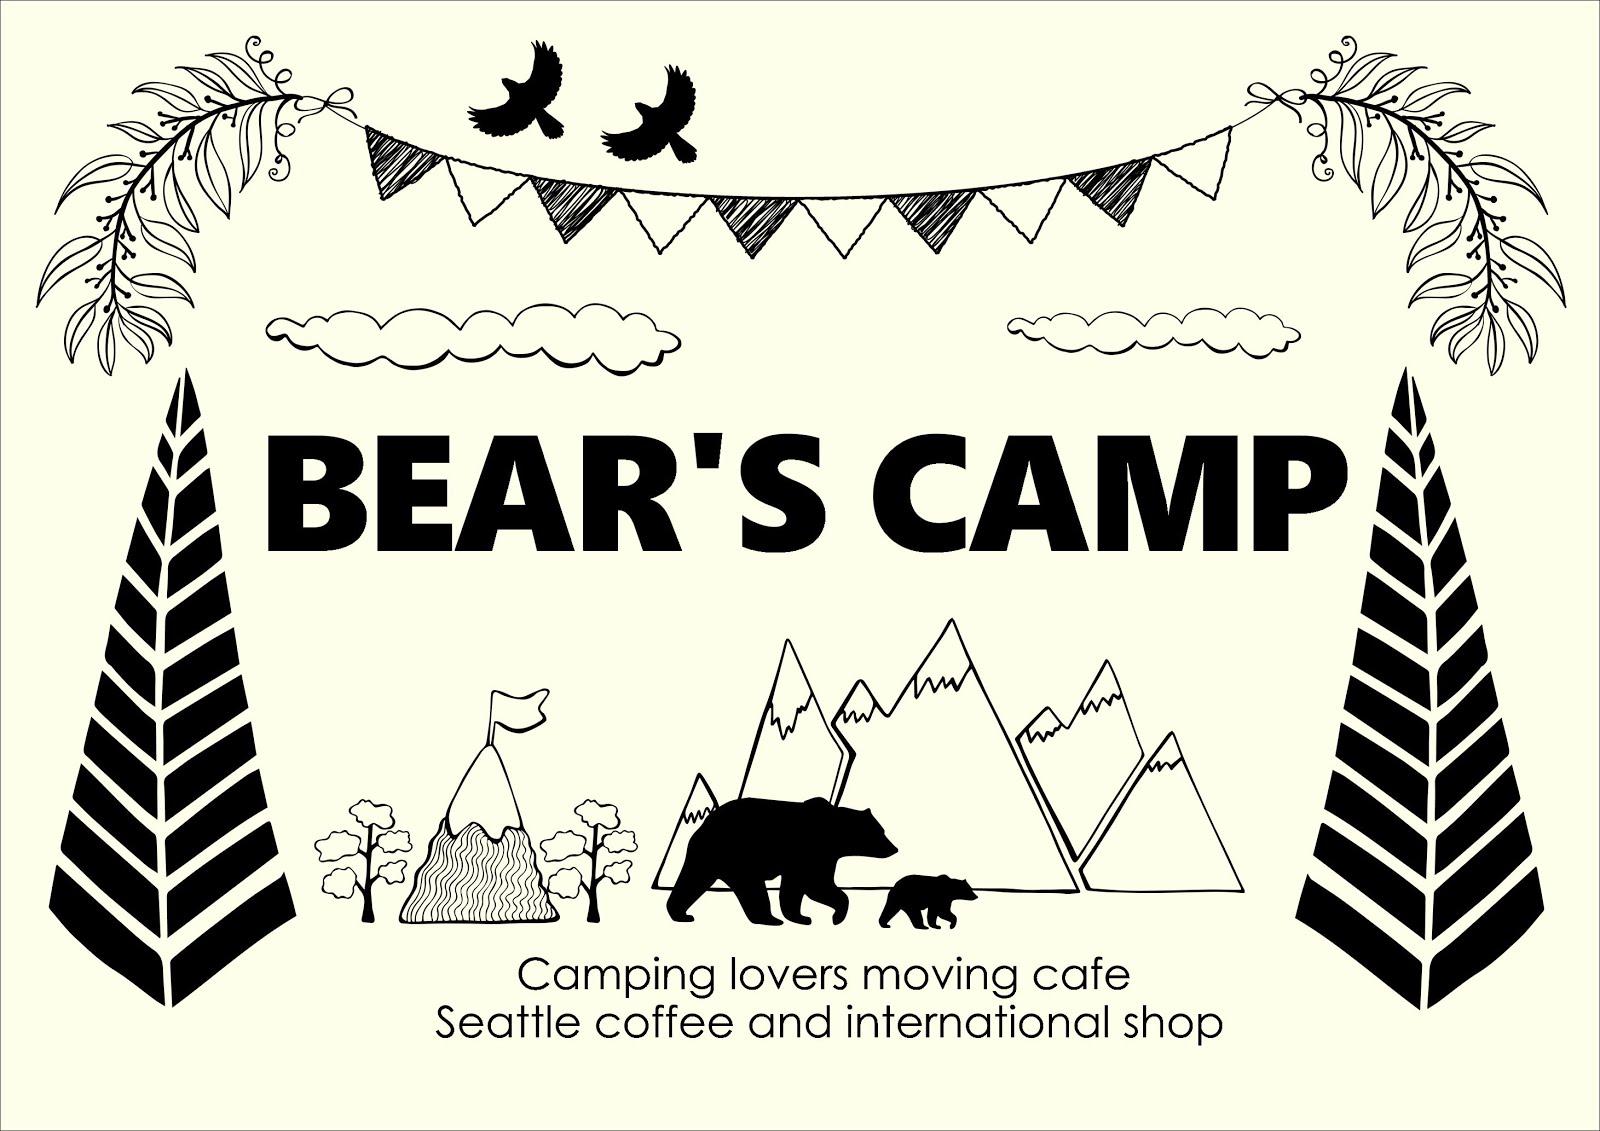 BEAR'S CAMP